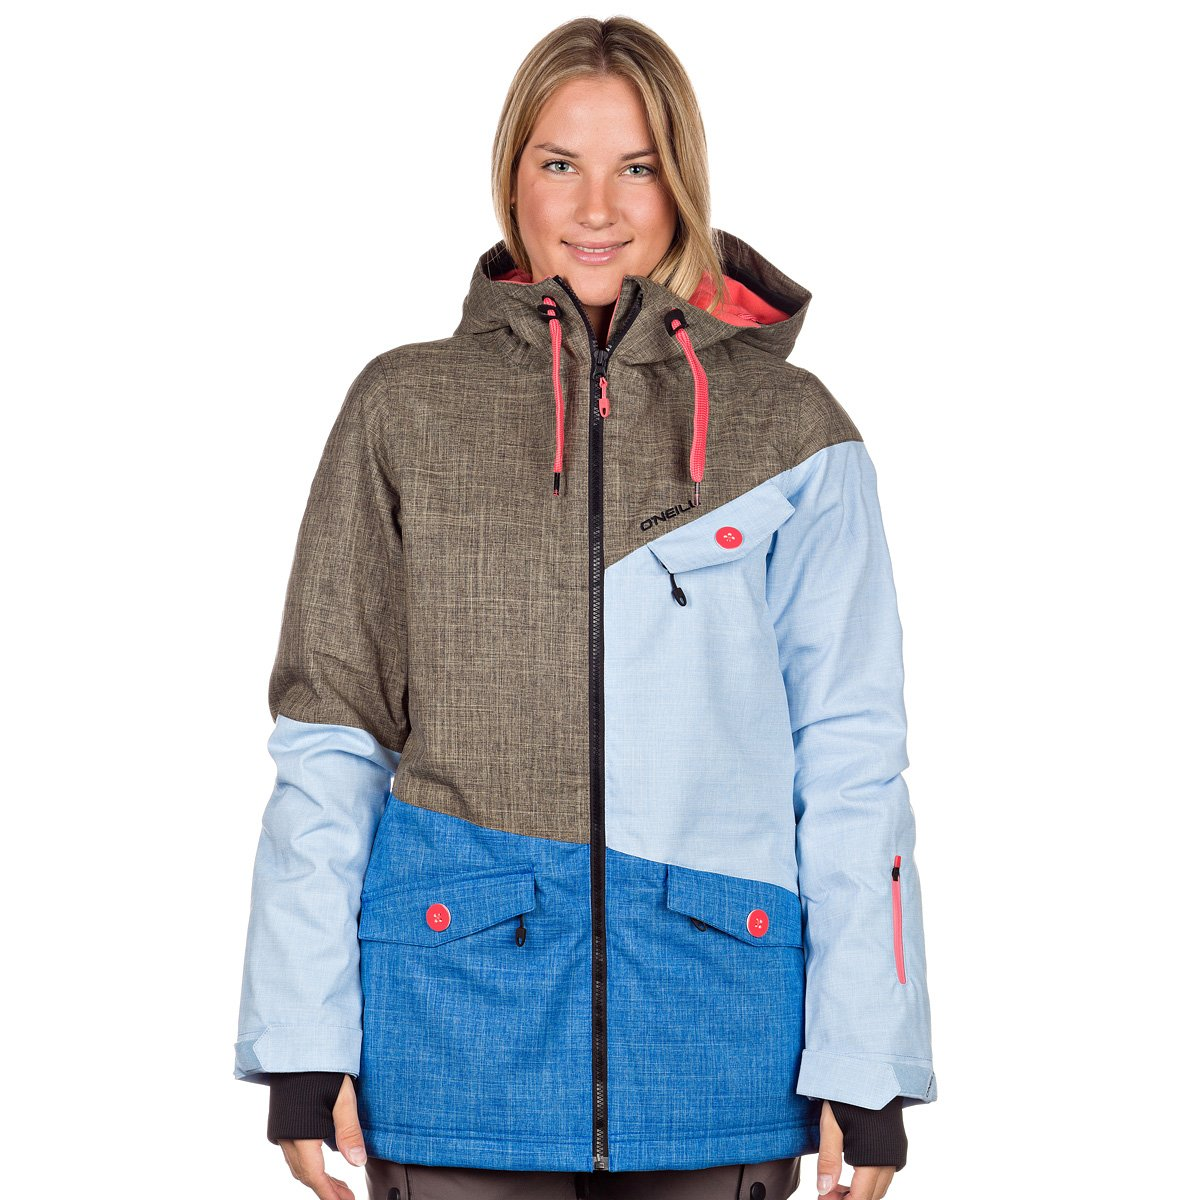 O'Neill Damen Snow Jacke PWFR SEGMENT günstig kaufen